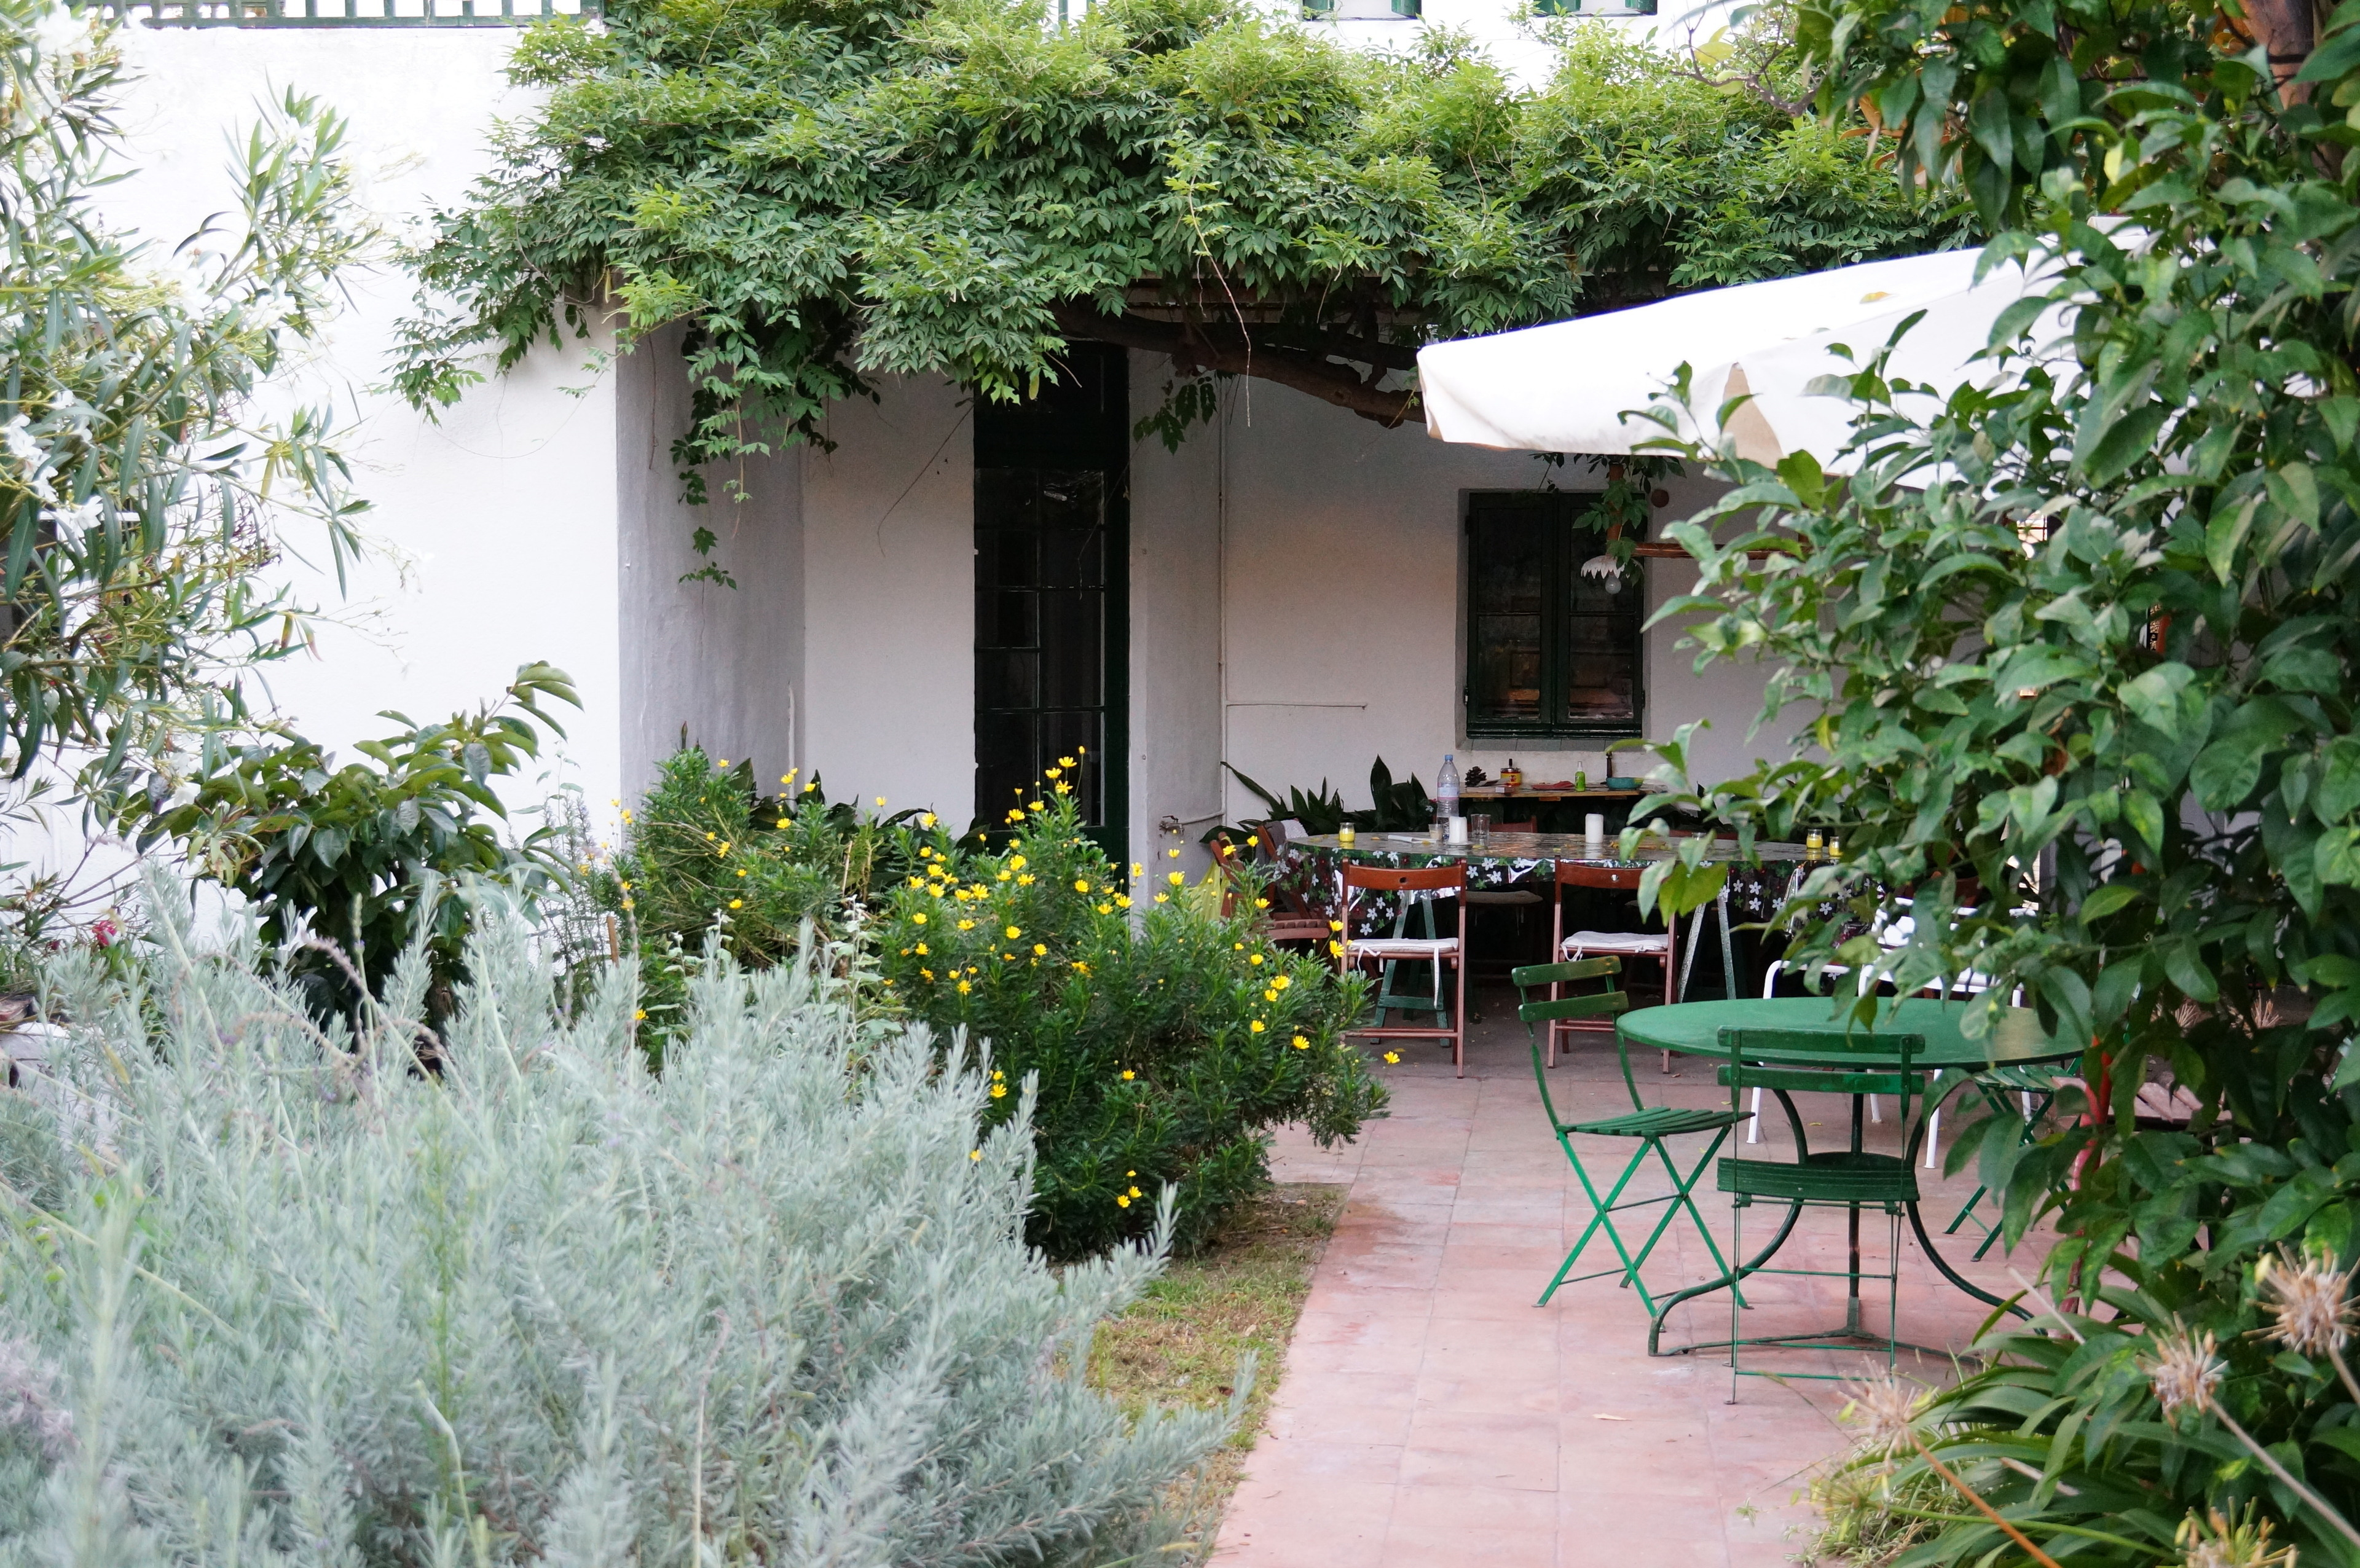 Ferienhaus Jugendstil Strandhaus (2626425), Caldes d'Estrac, Costa del Meresme, Katalonien, Spanien, Bild 3